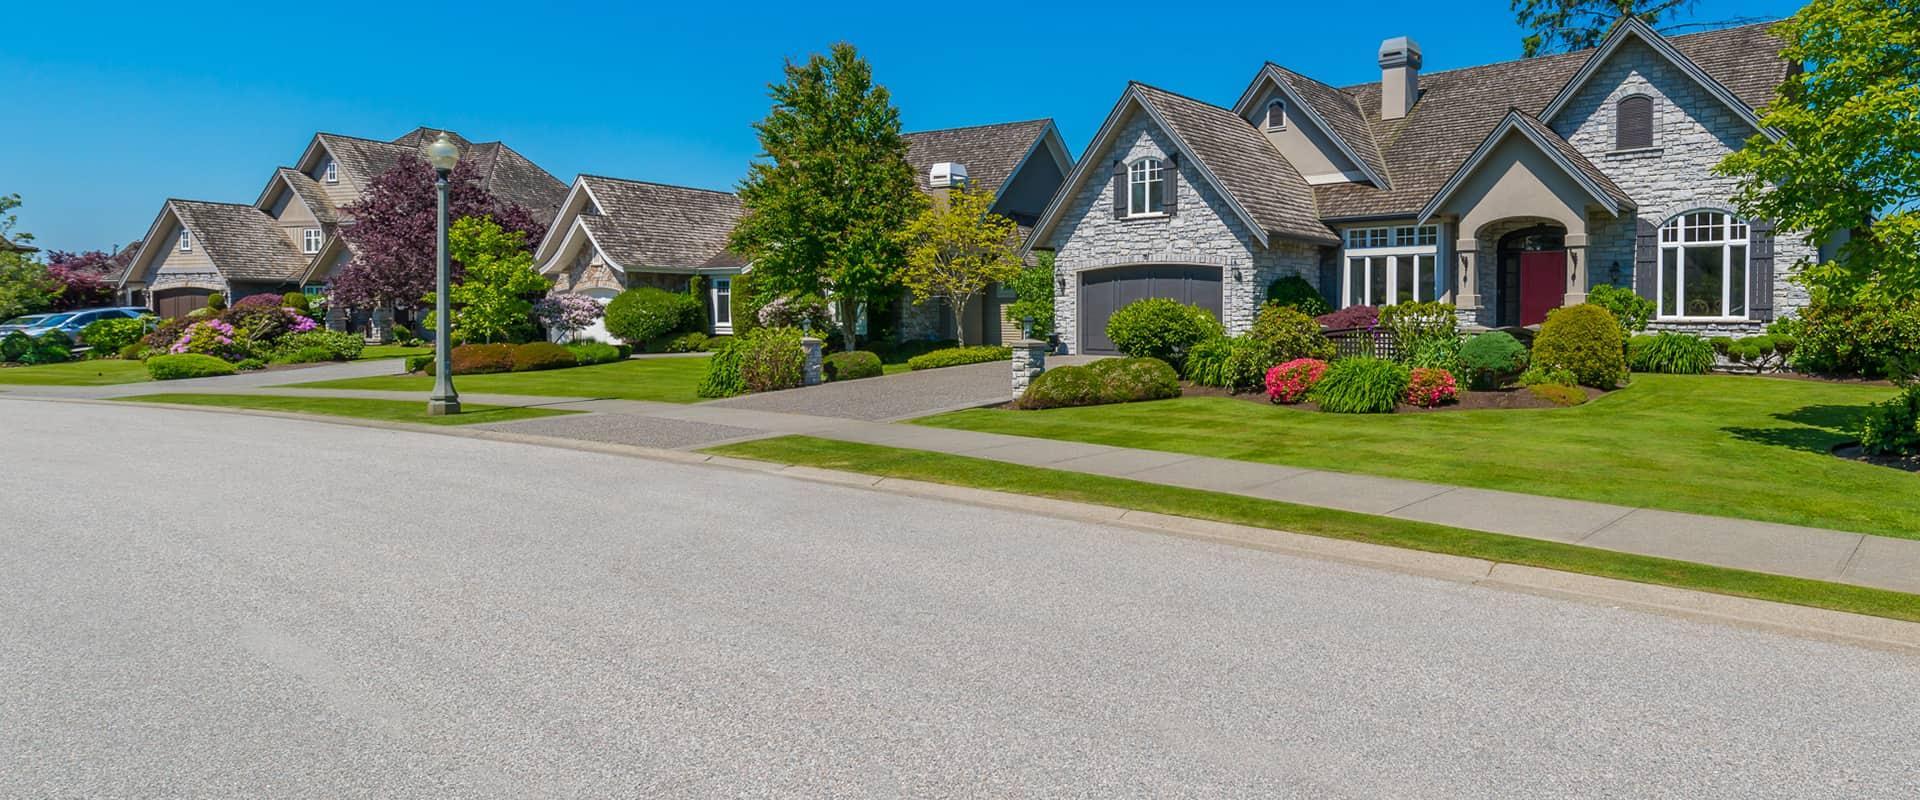 street view of a residential neighborhood in edenton north carolina